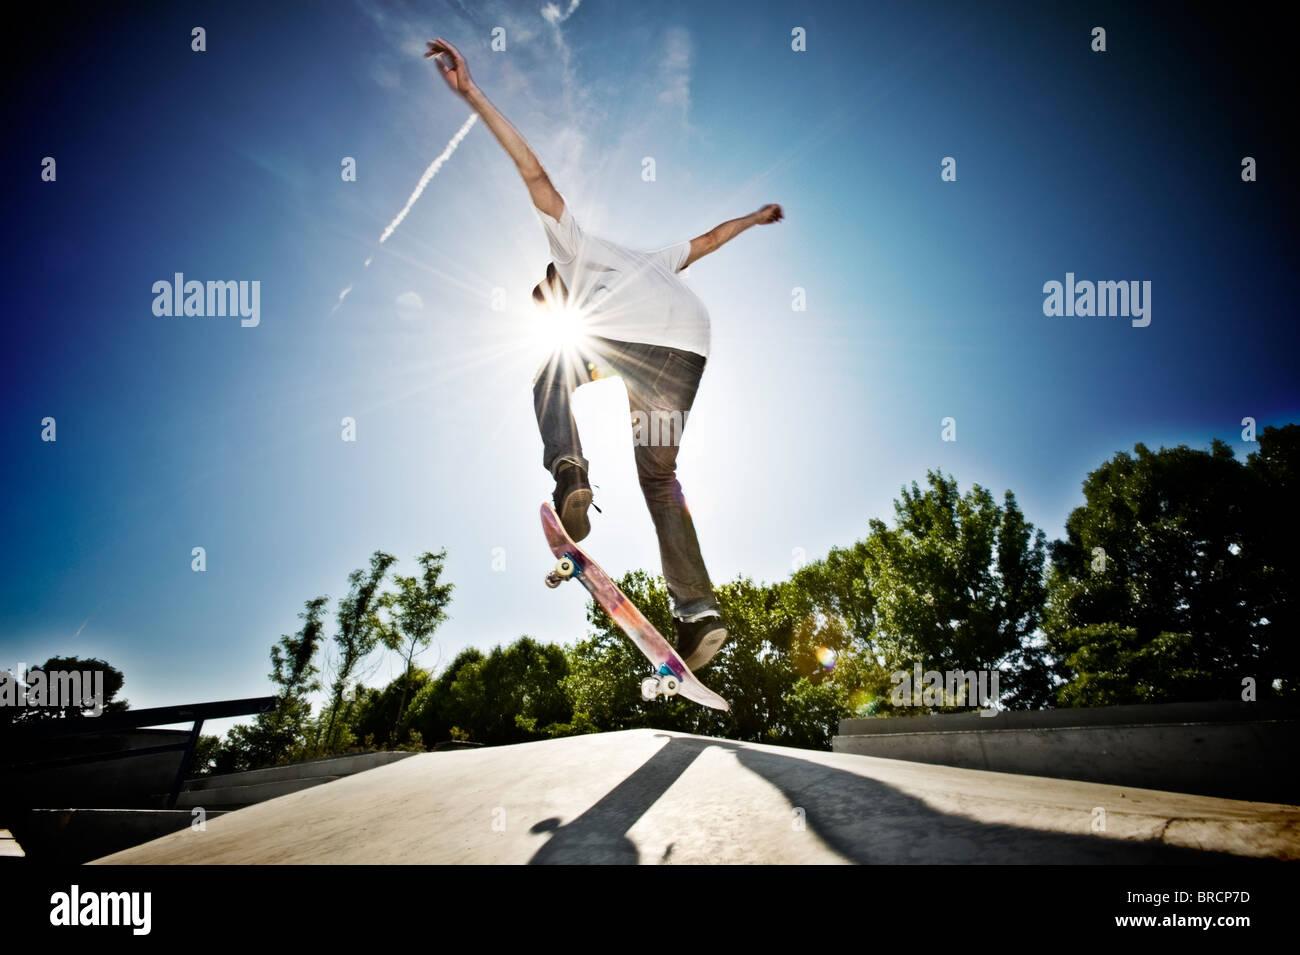 Skateboarder doing a skateboard trick - Stock Image